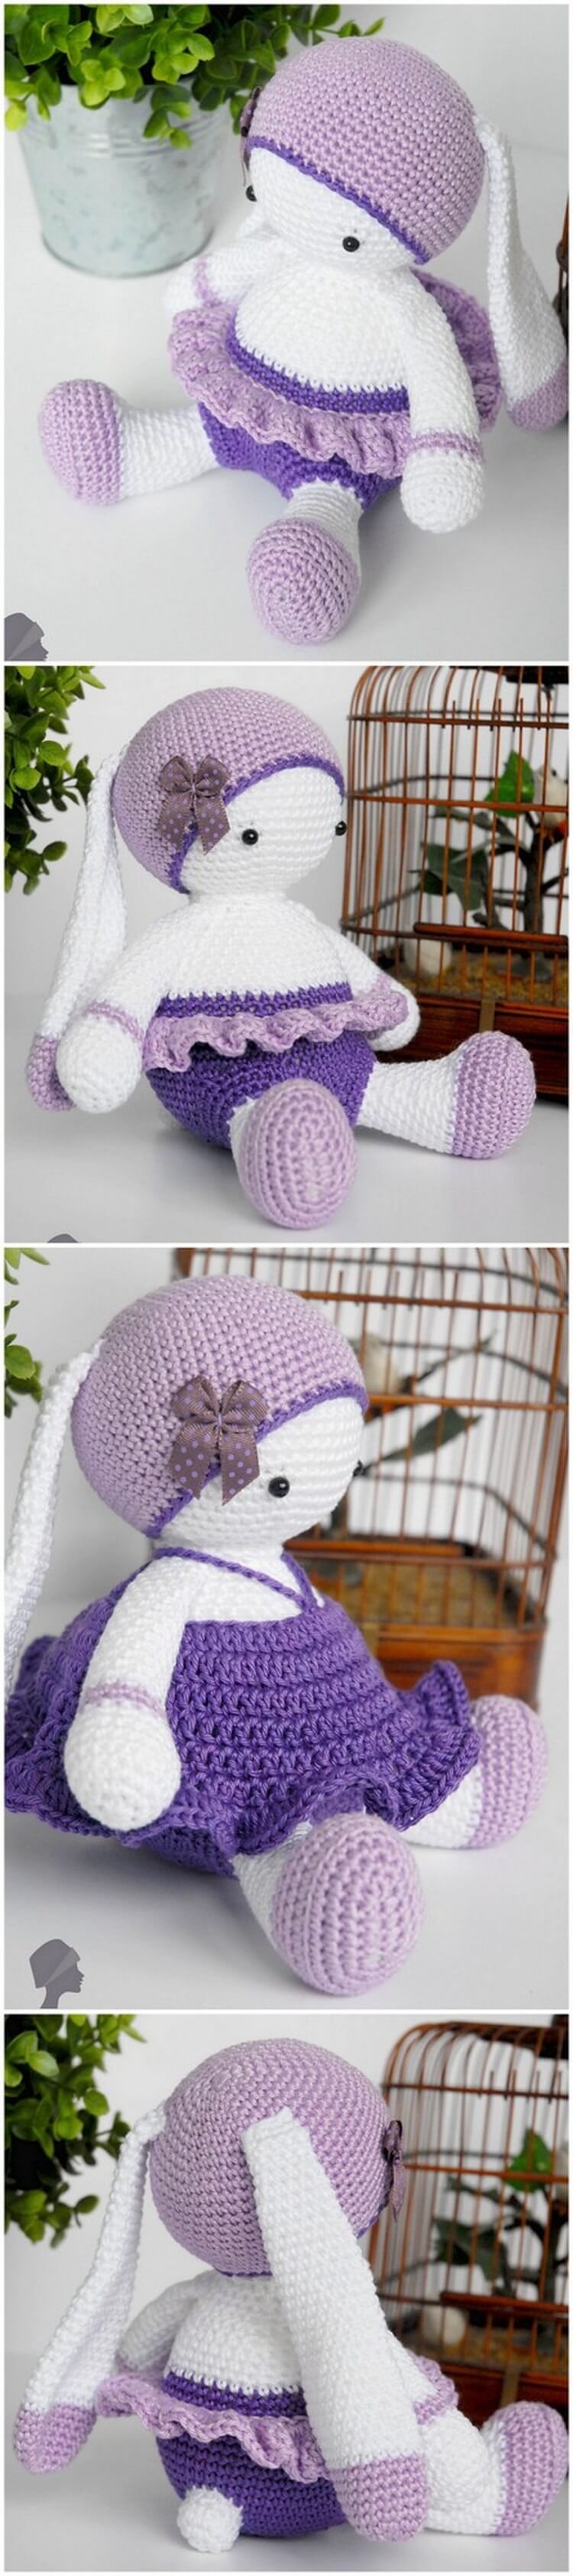 Crochet Amigurumi Pattern (107)